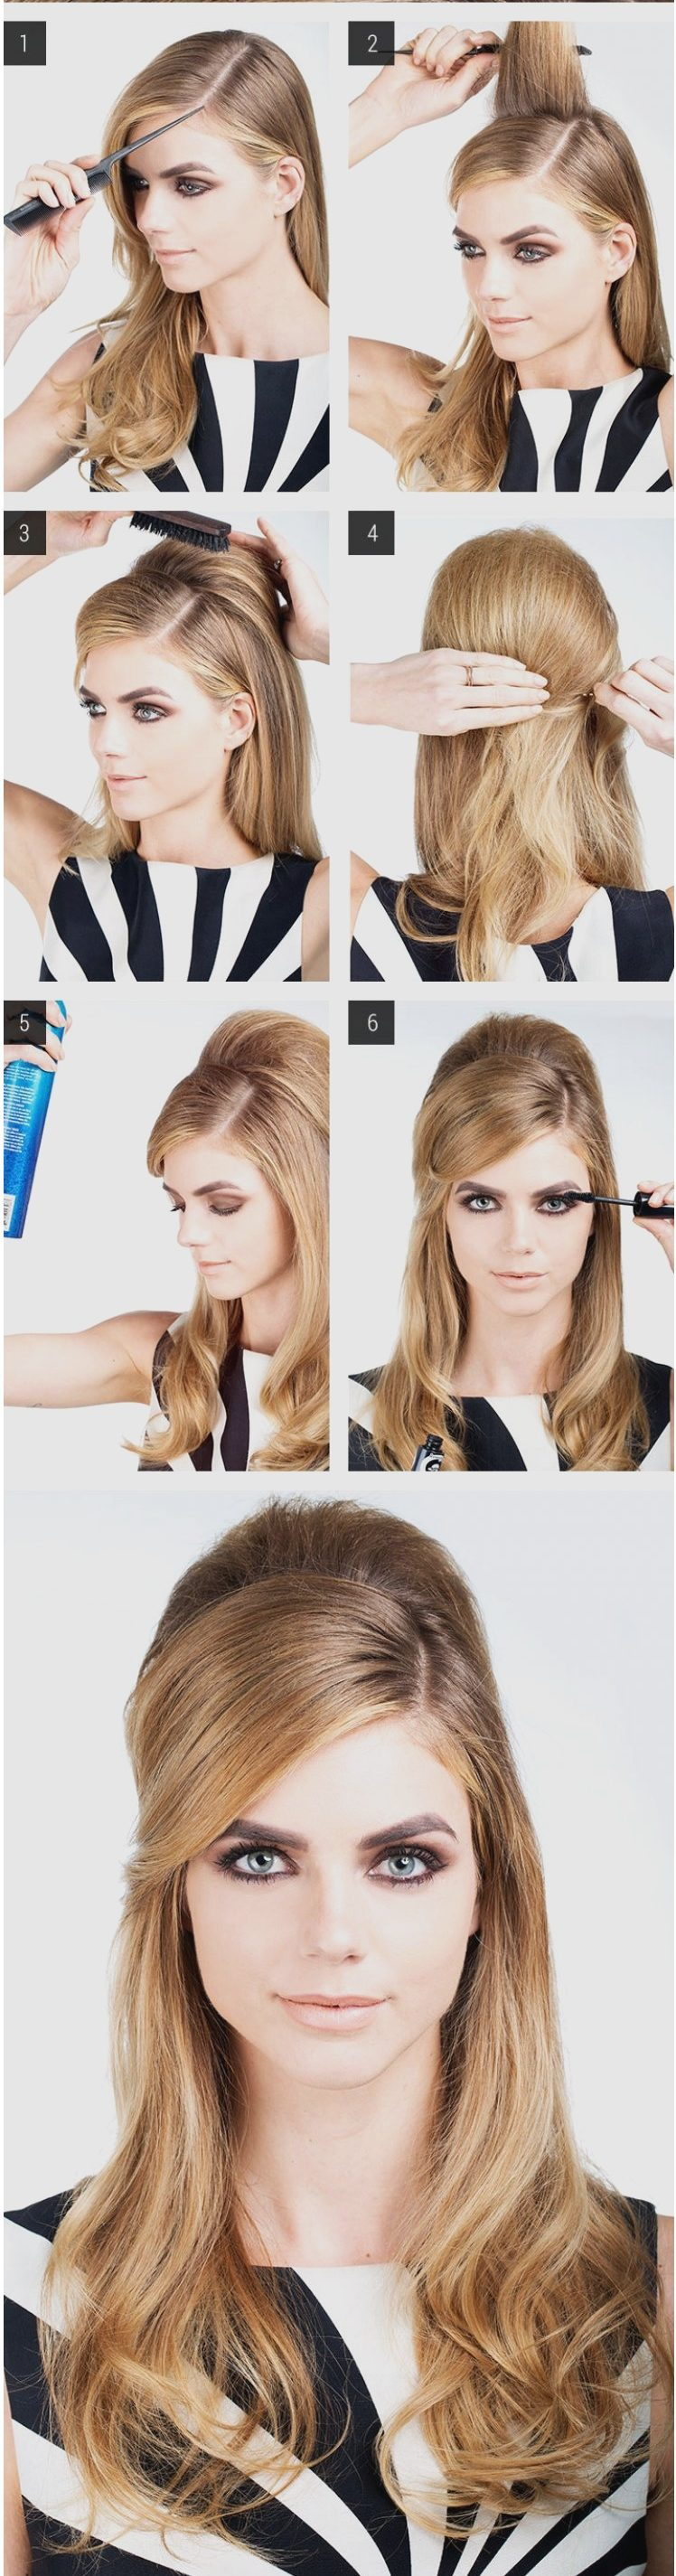 peinado con copete para mujer